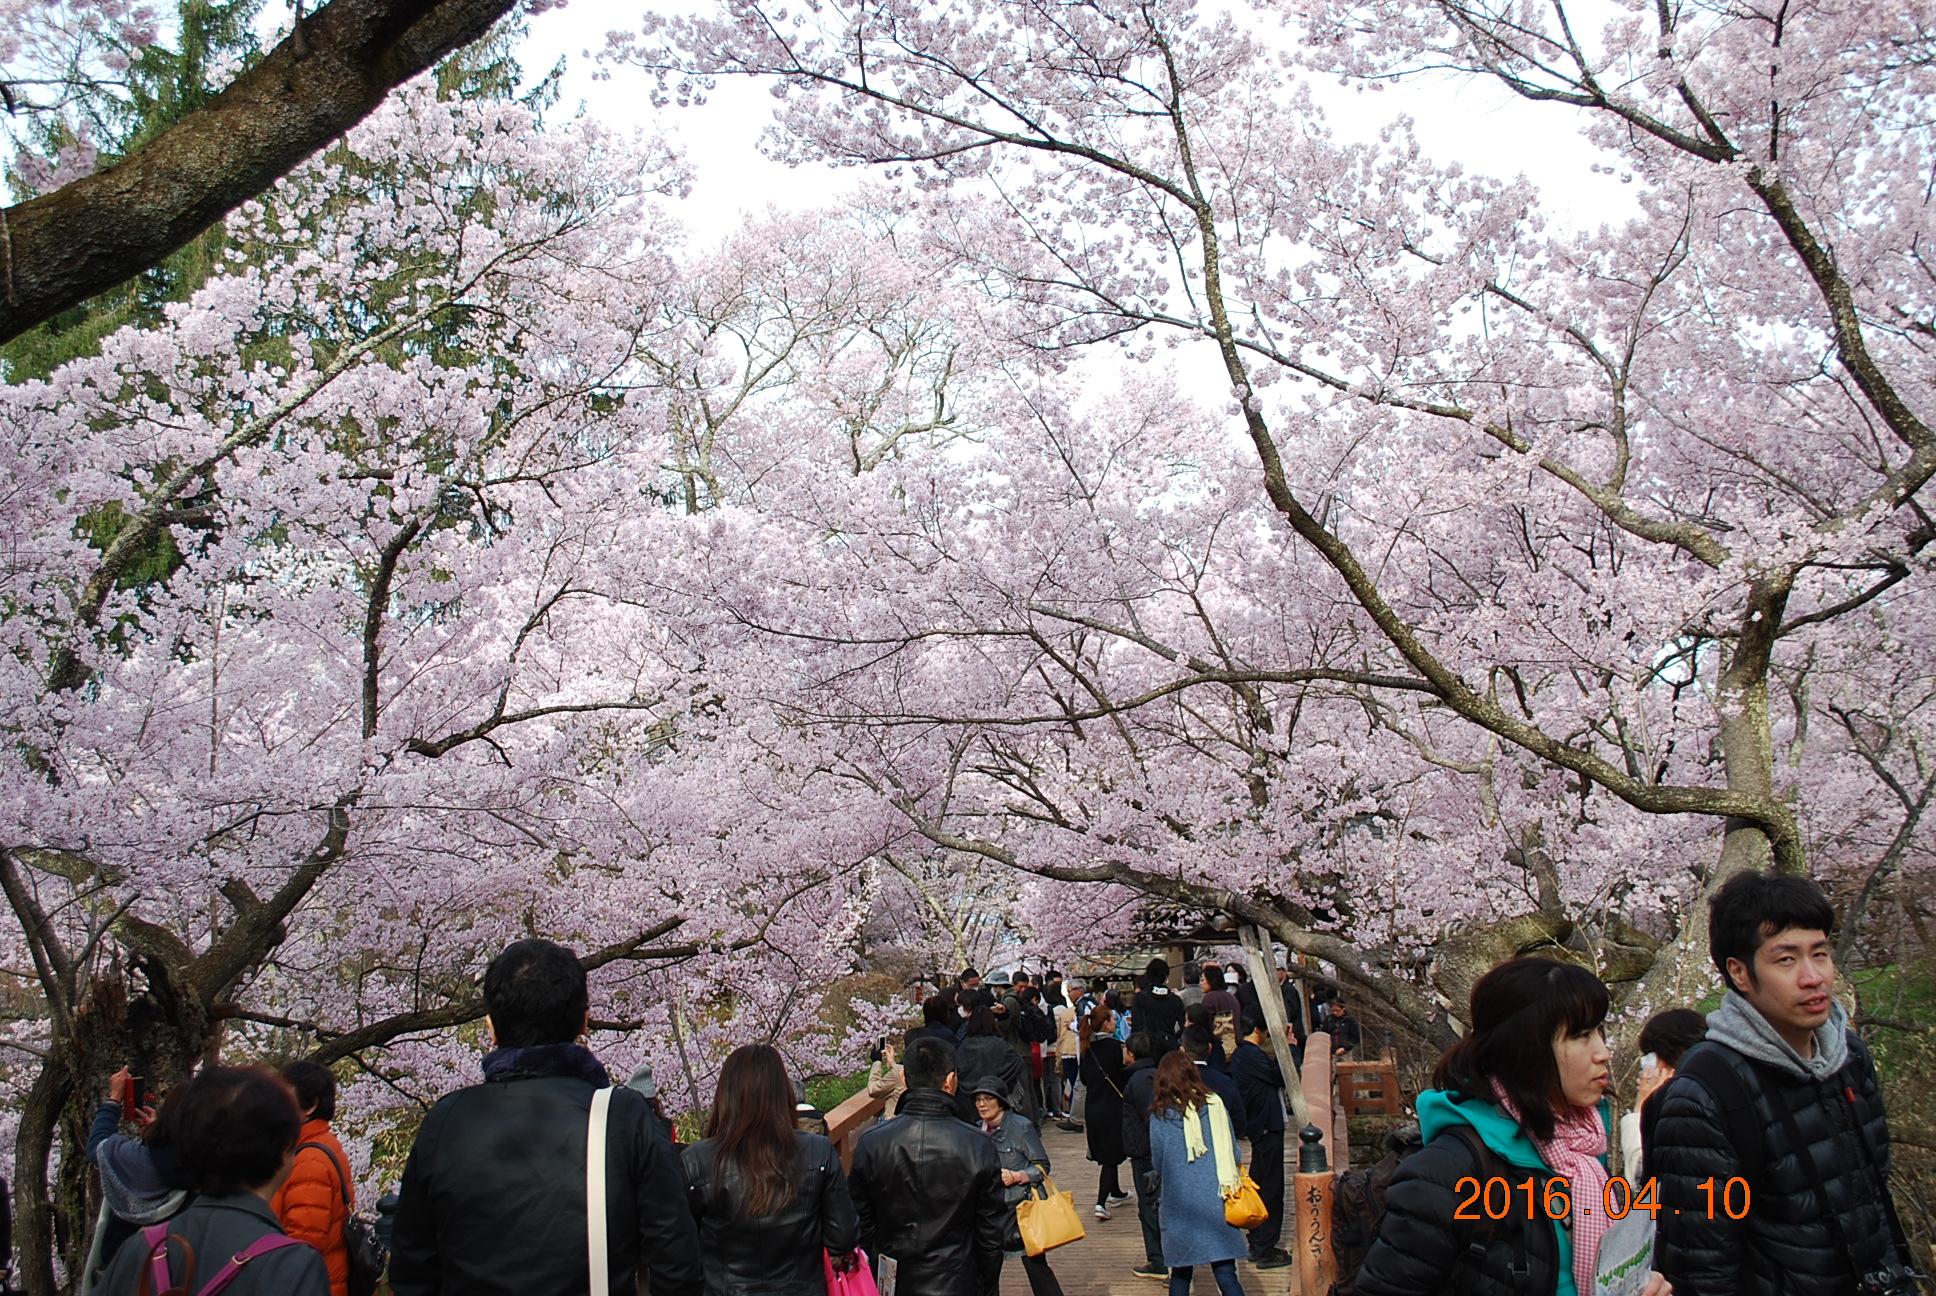 2016_0410_073819-DSC_4880.jpg